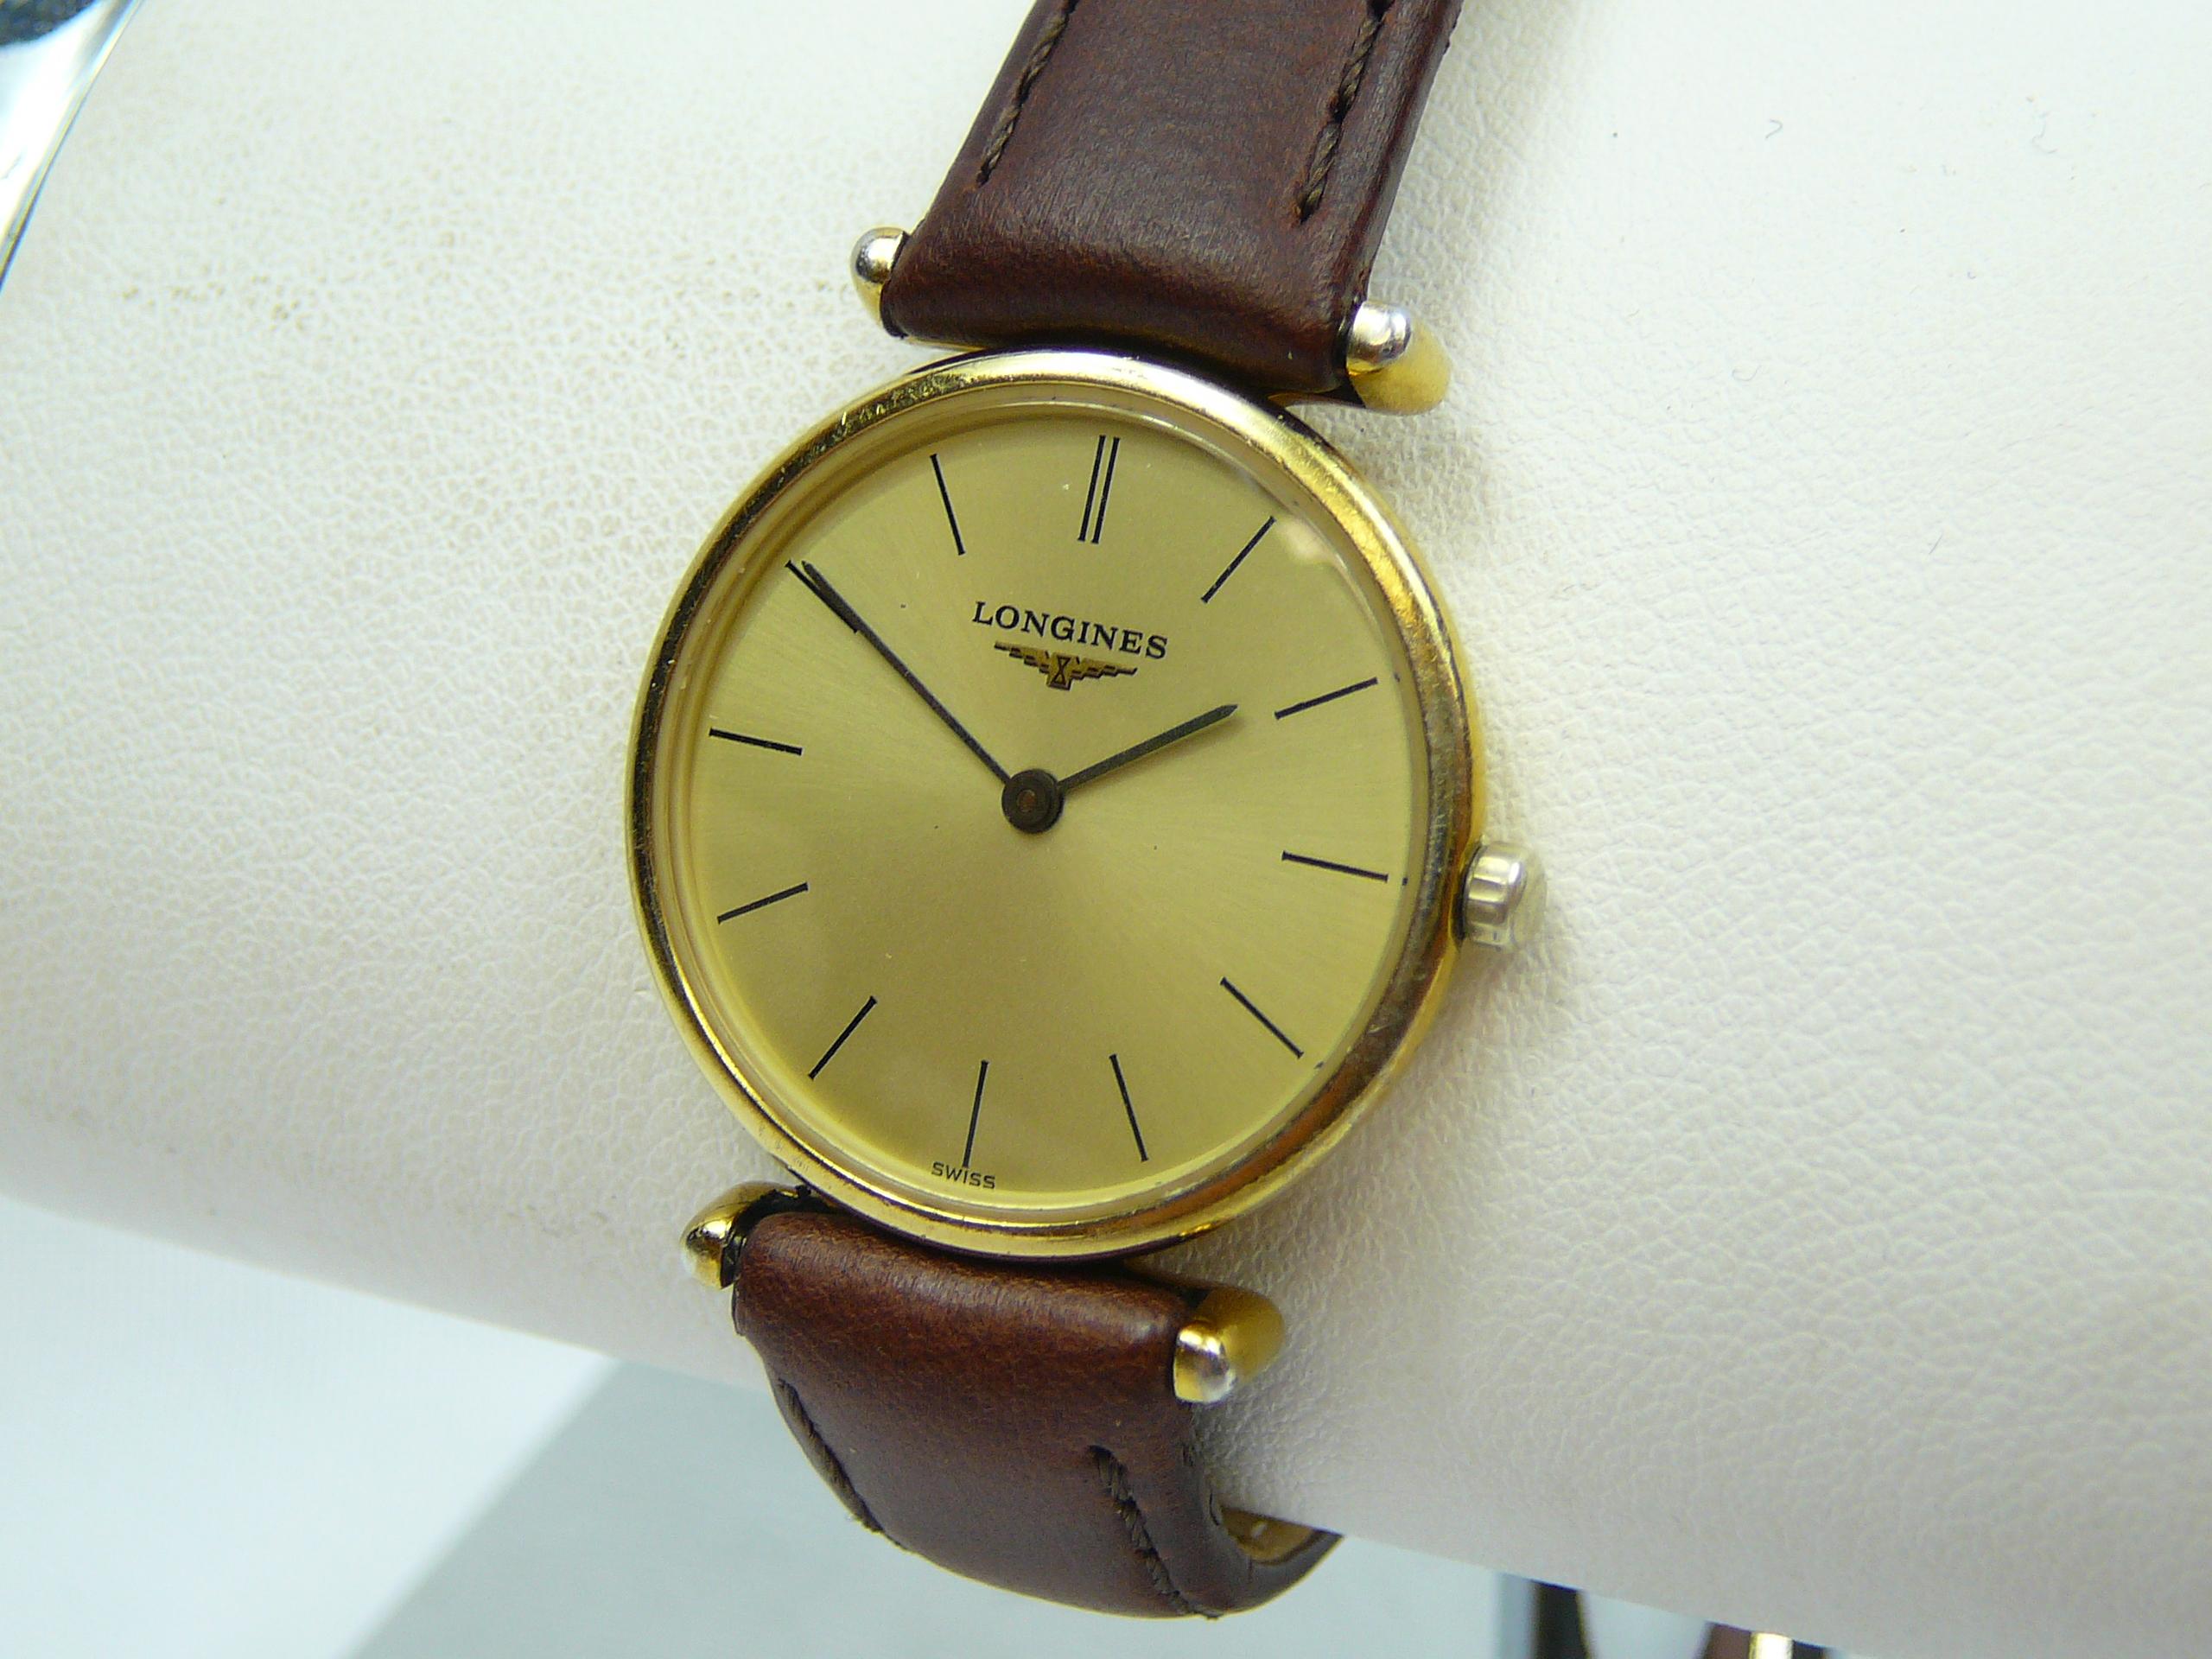 Ladies Longines Wrist Watch - Image 2 of 3